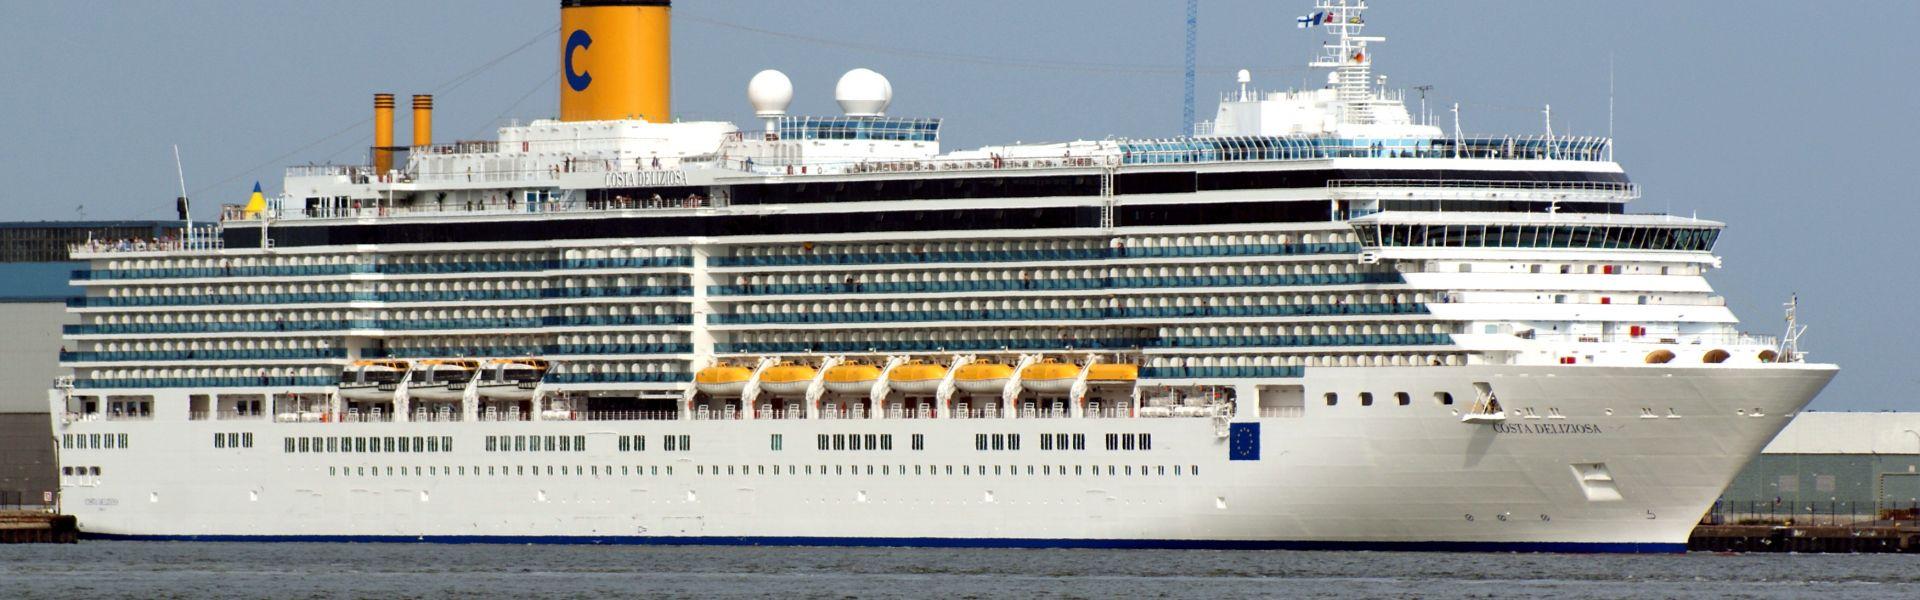 Croaziera 2016 - Caraibele de Vest (Port Everglades) - Costa Deliziosa - Costa Cruises - 7 nopti - ZBOR INCLUS